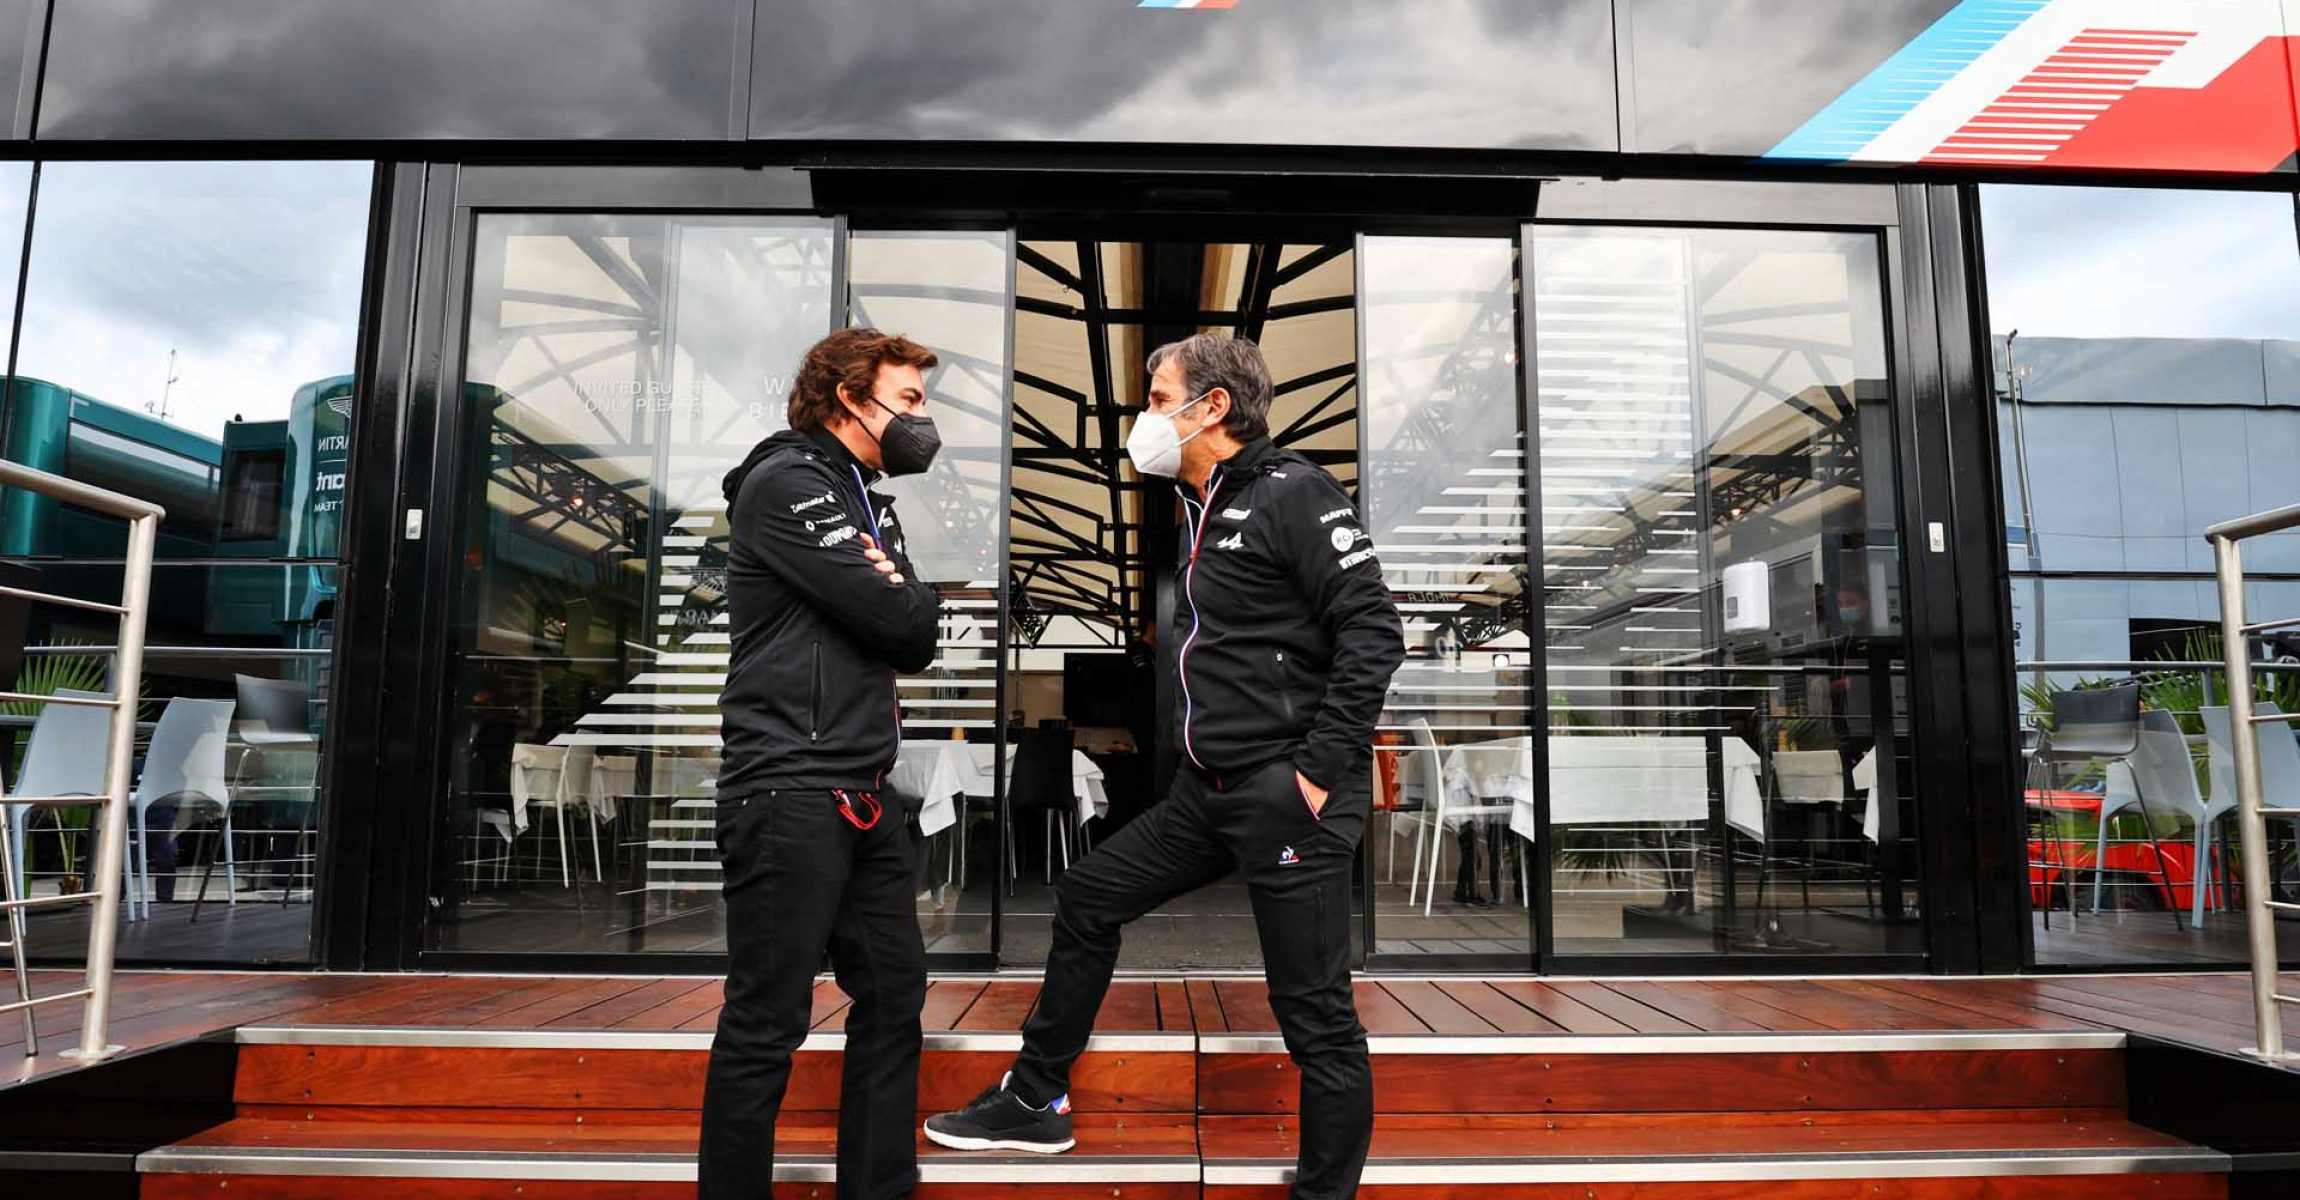 (L to R): Fernando Alonso (ESP) Alpine F1 Team with Davide Brivio (ITA) Alpine F1 Team Racing Director. Emilia Romagna Grand Prix, Thursday 15th April 2021. Imola, Italy.